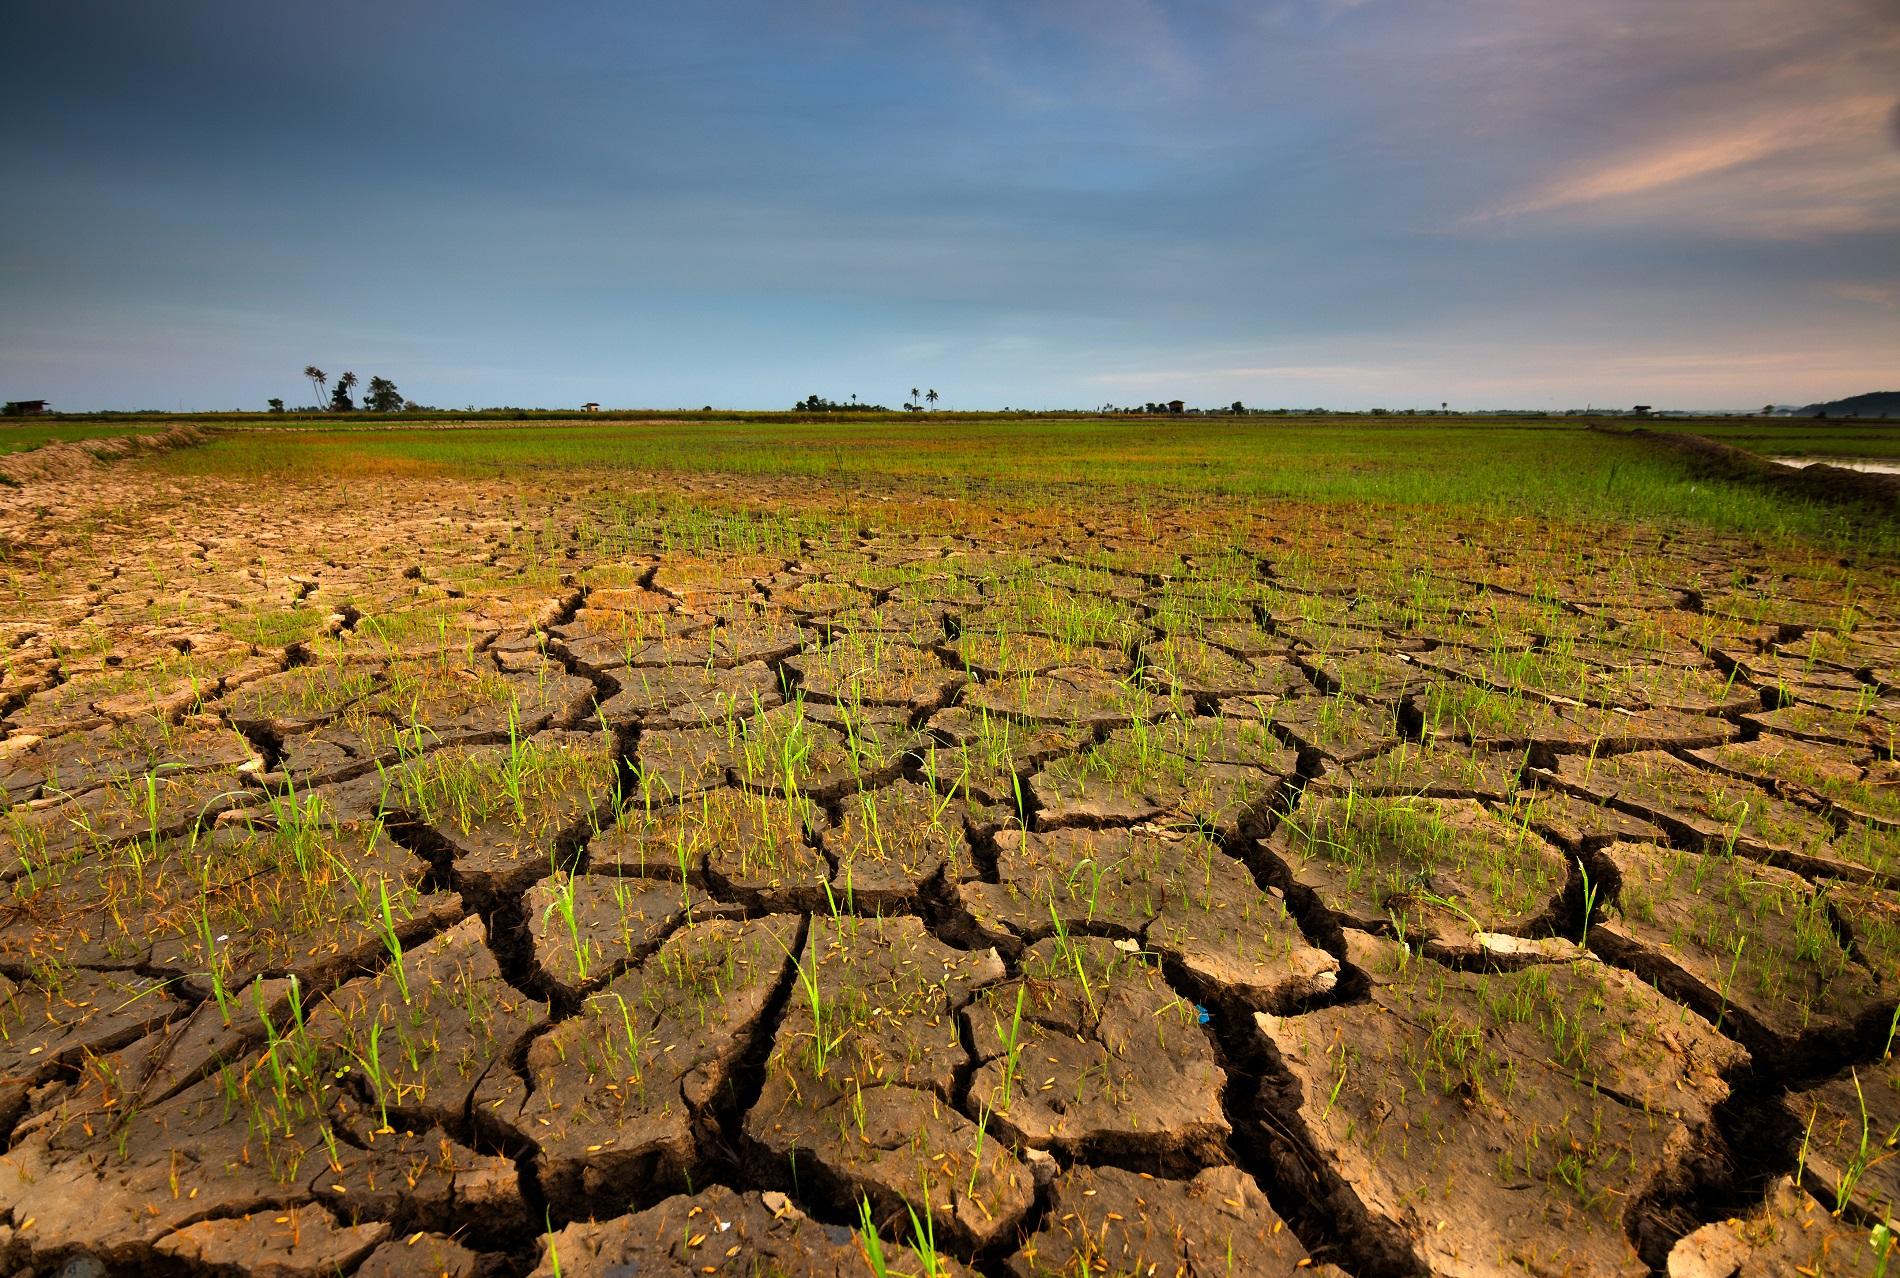 Buenas prácticas agrícolas: Prácticas de cultivo para reducir la erosión